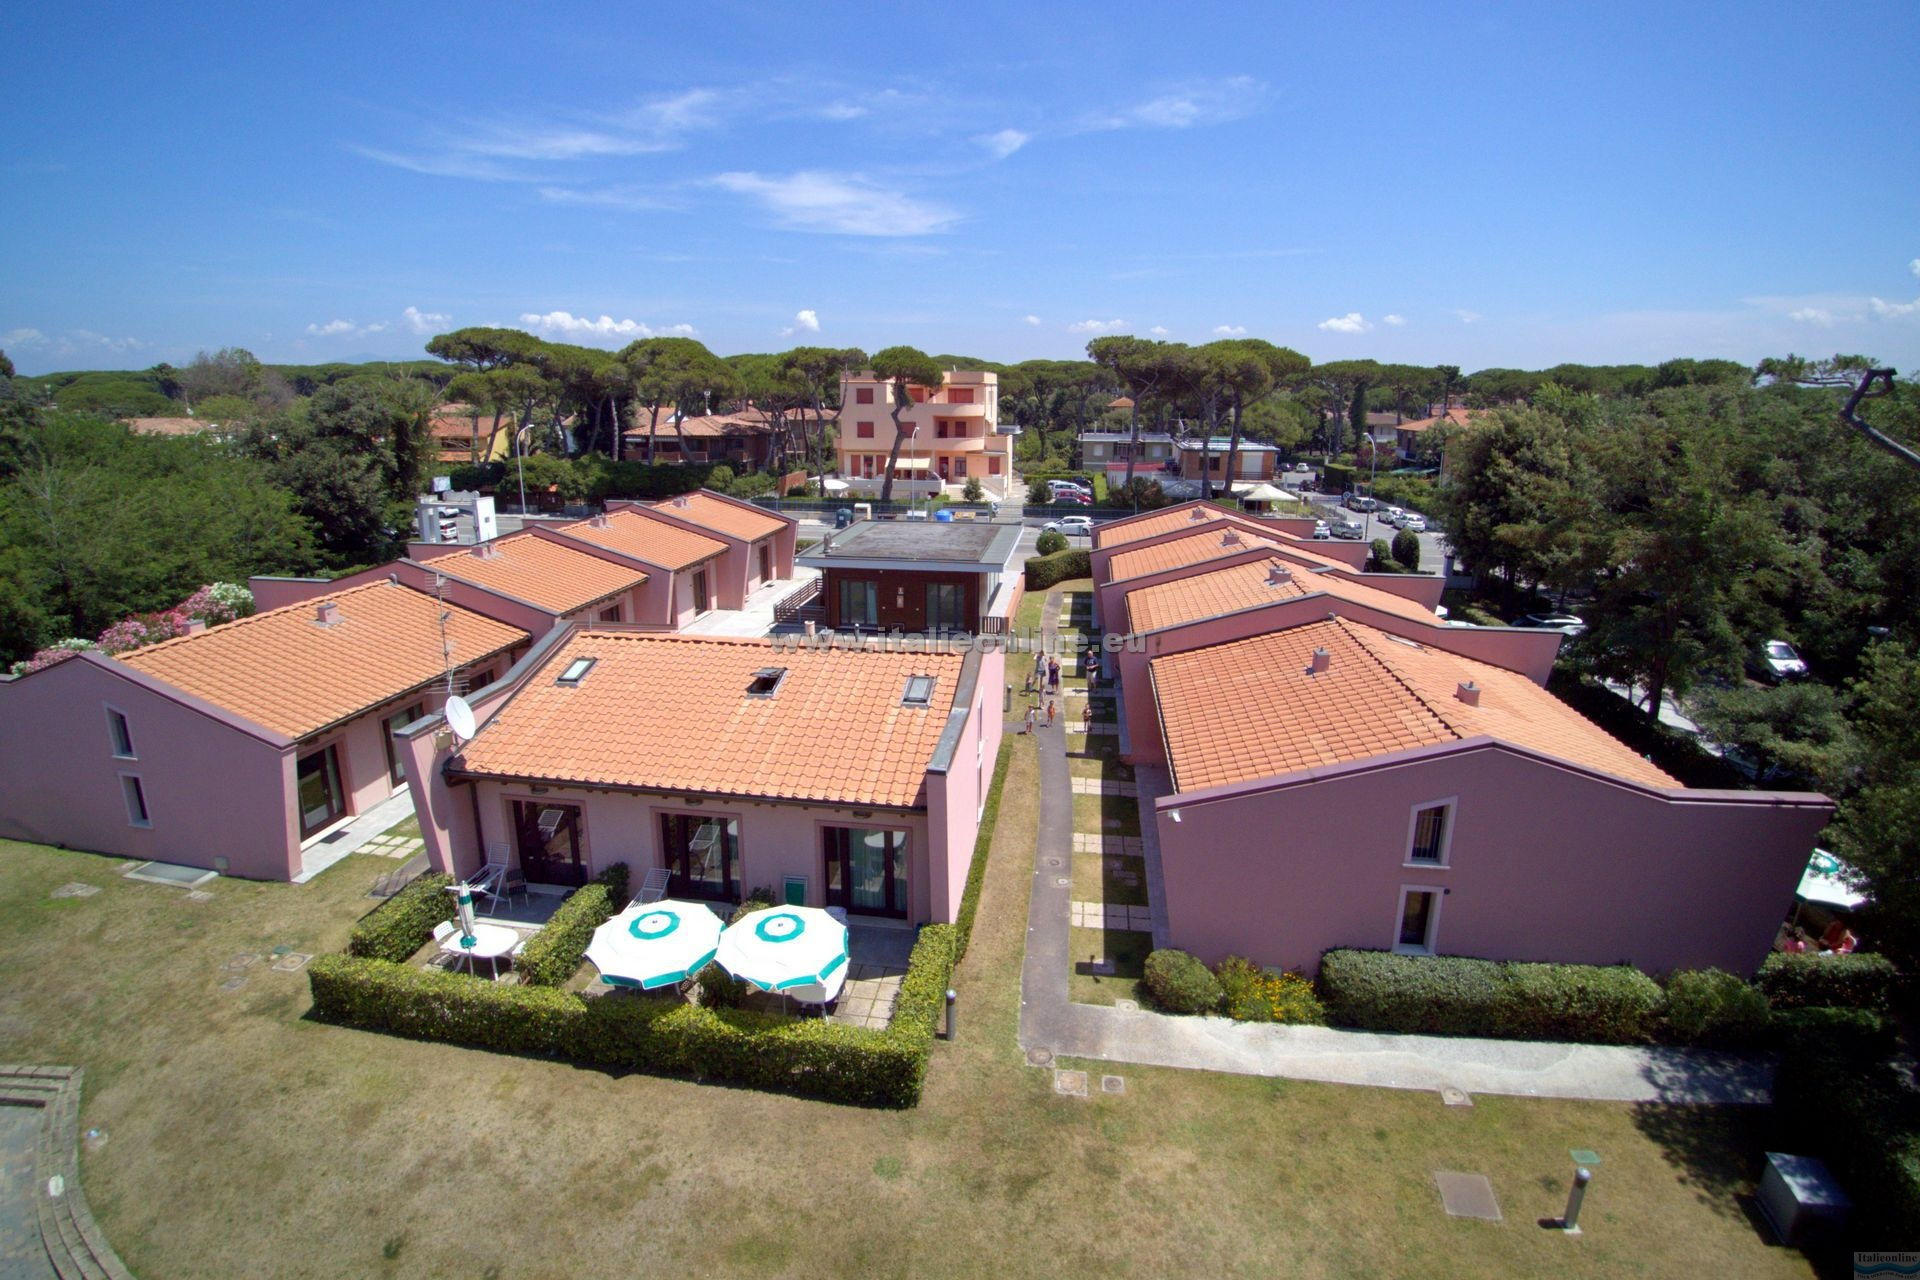 Miramare resort tirrenia italien italieonline